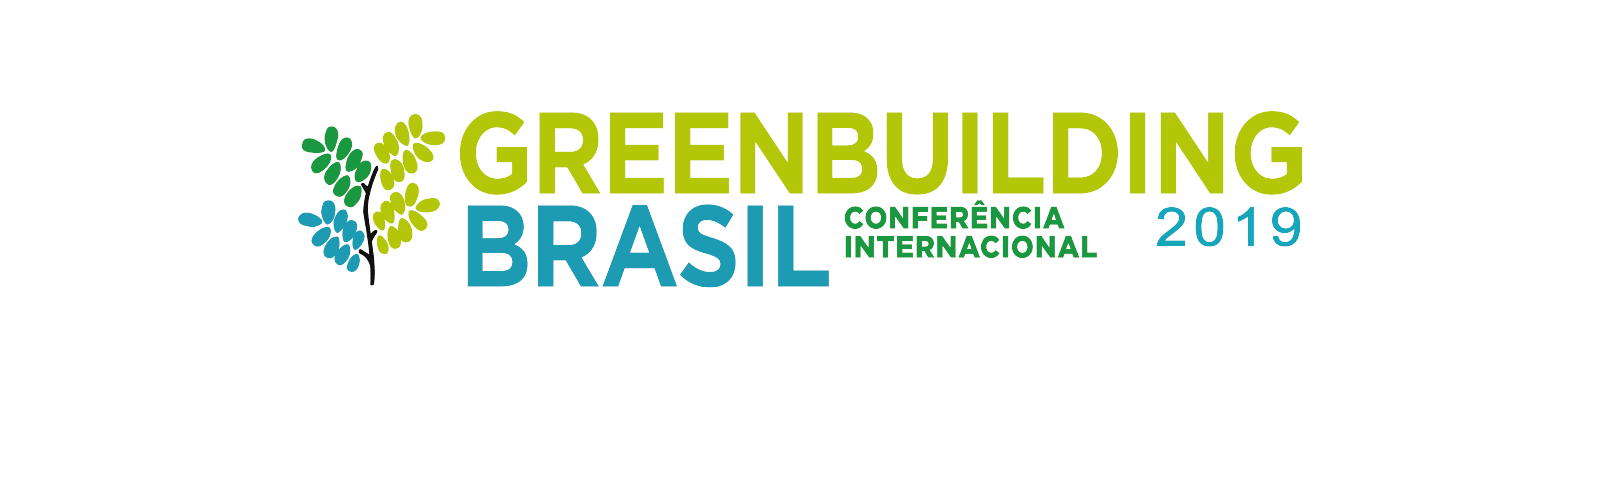 Logo Greebuilding Brasil 2019